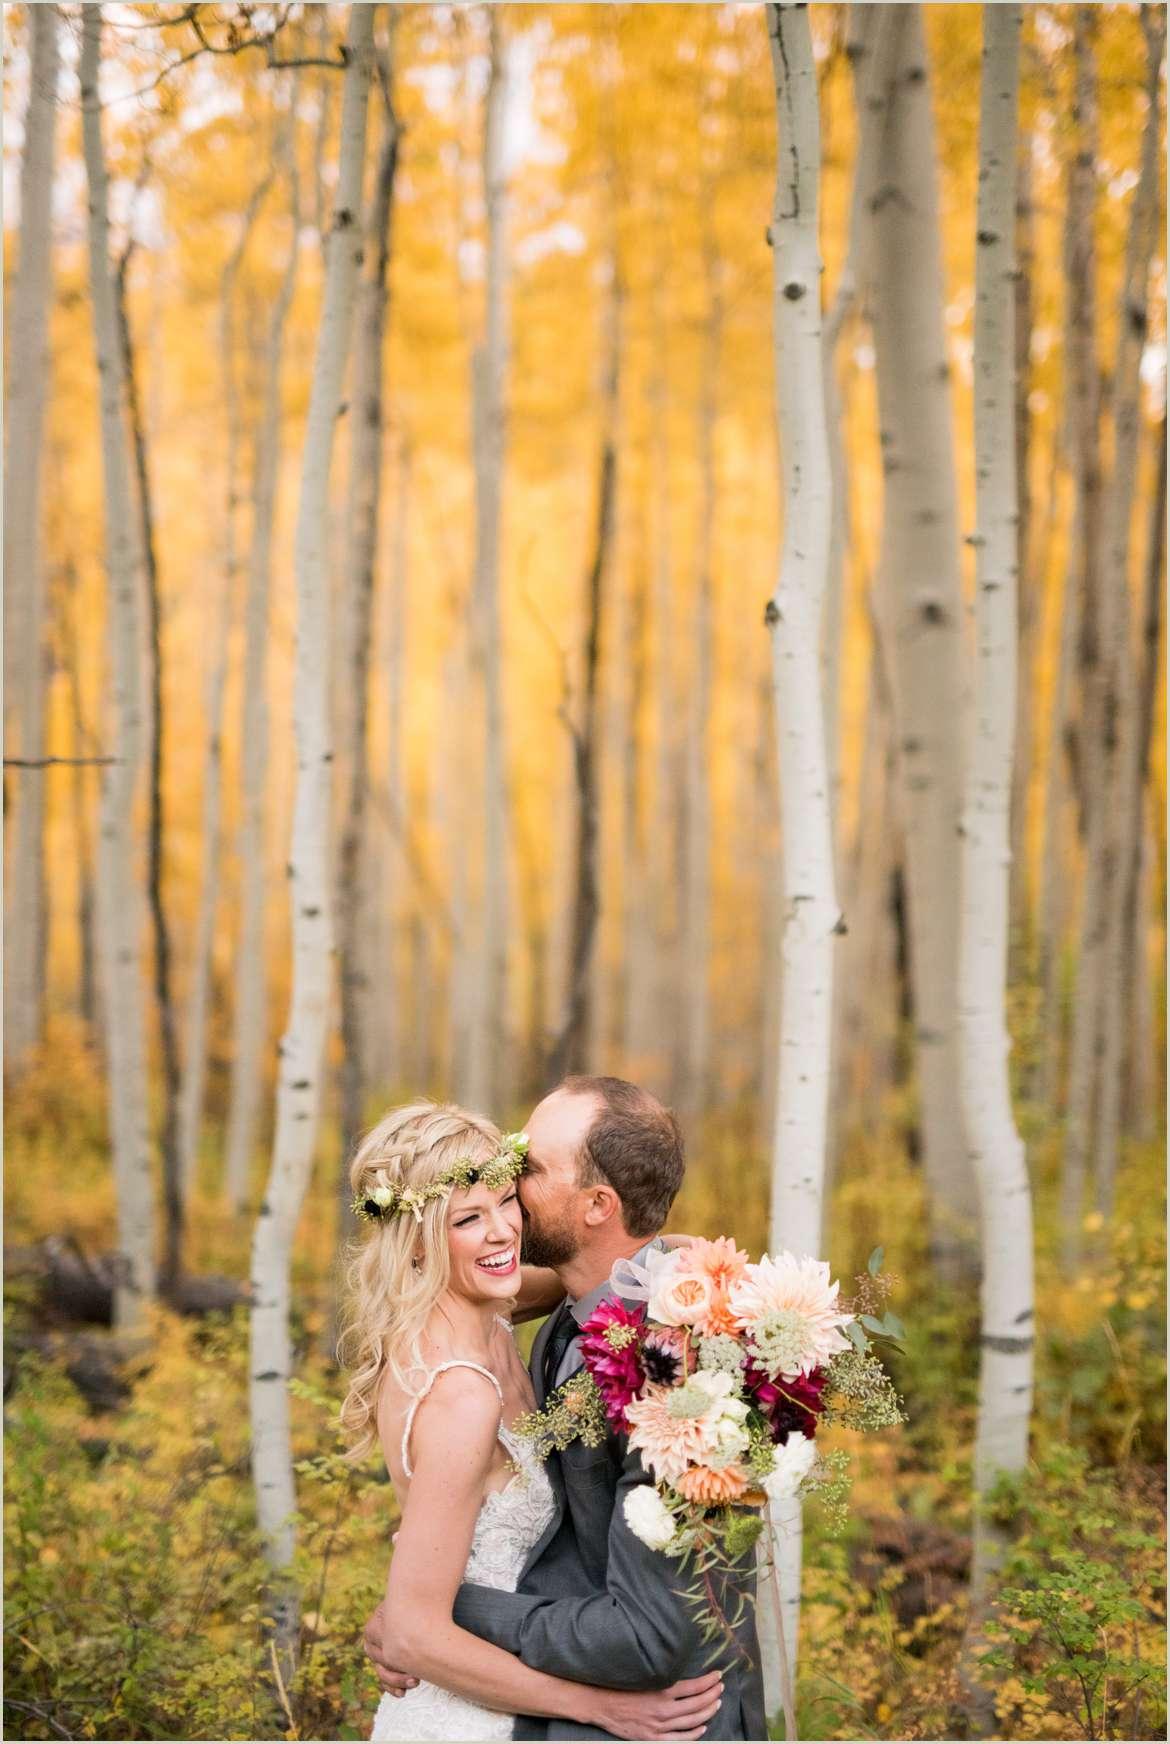 wedding photos in aspens in peak fall